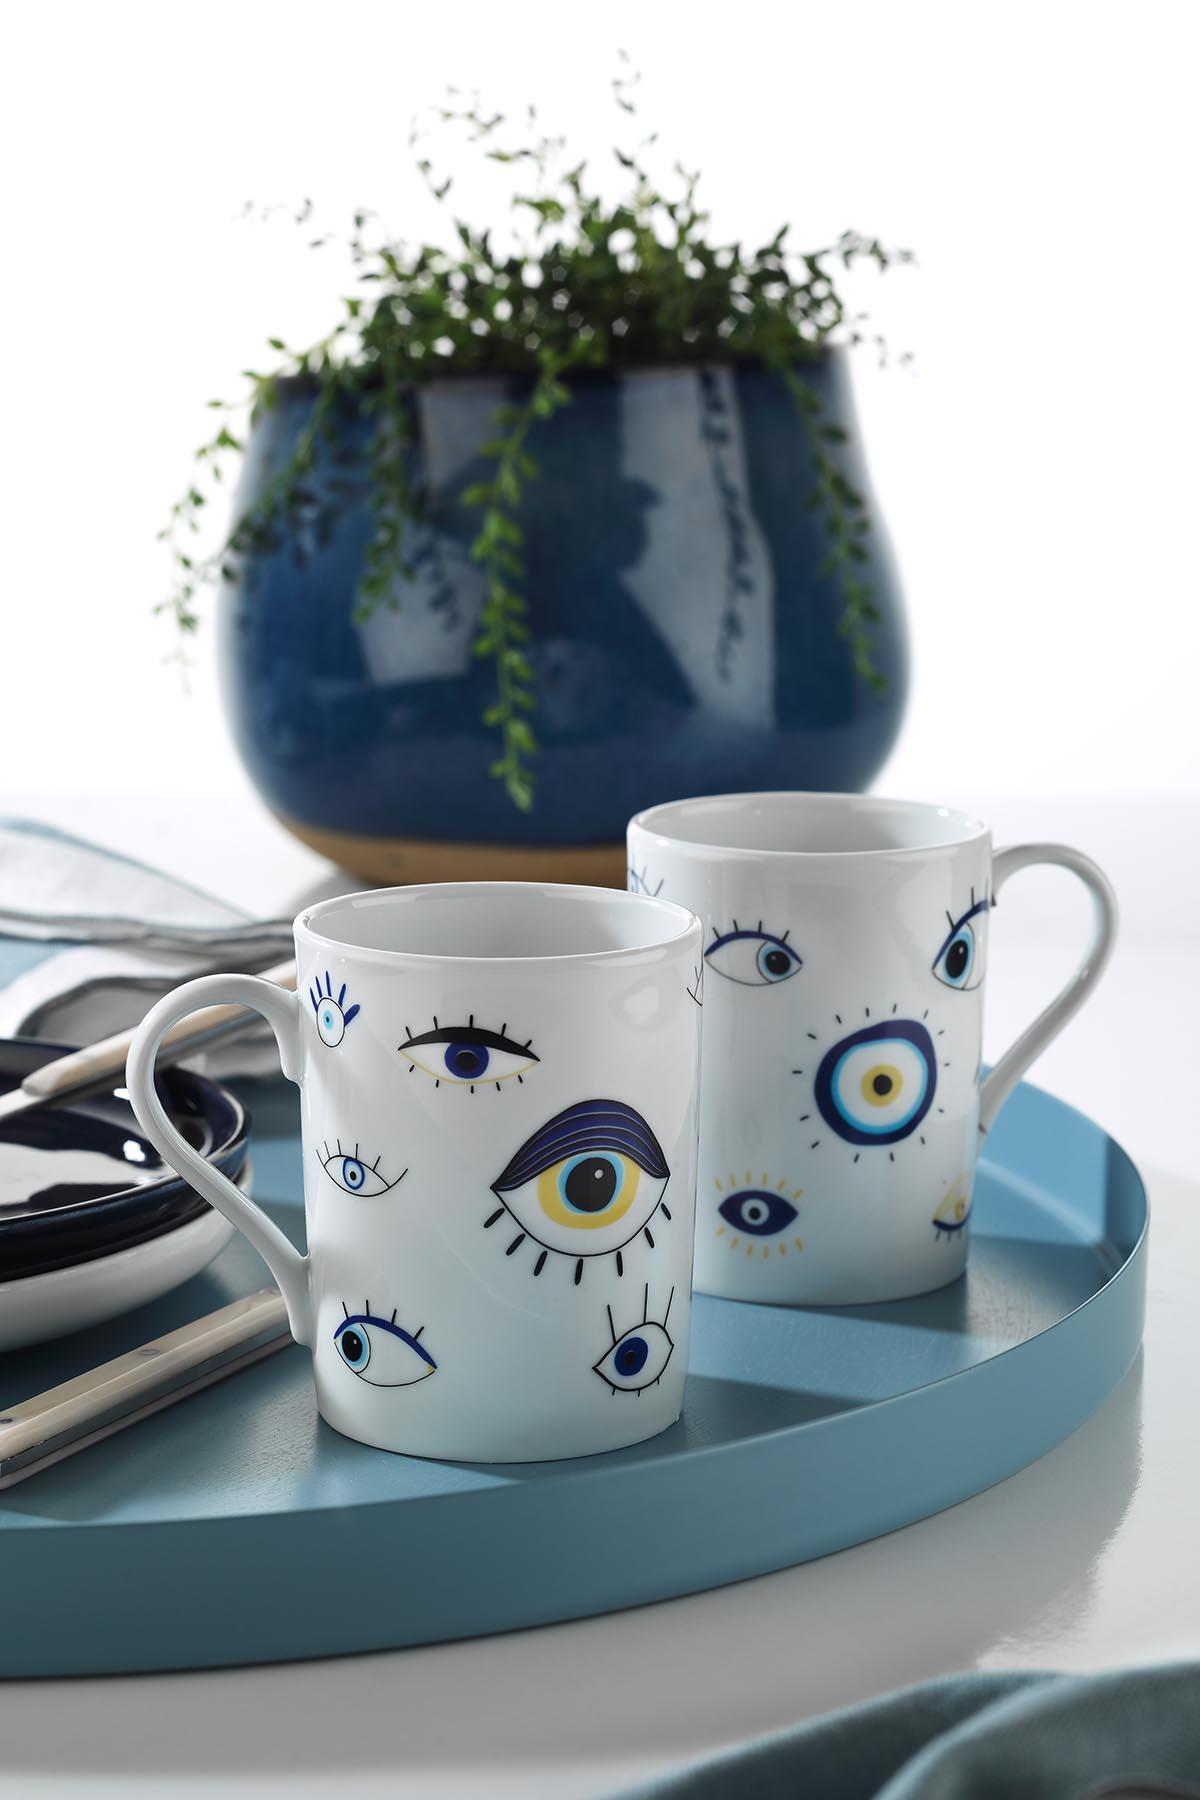 Kütahya Porselen Forest 2'li Mug Bardak 11013